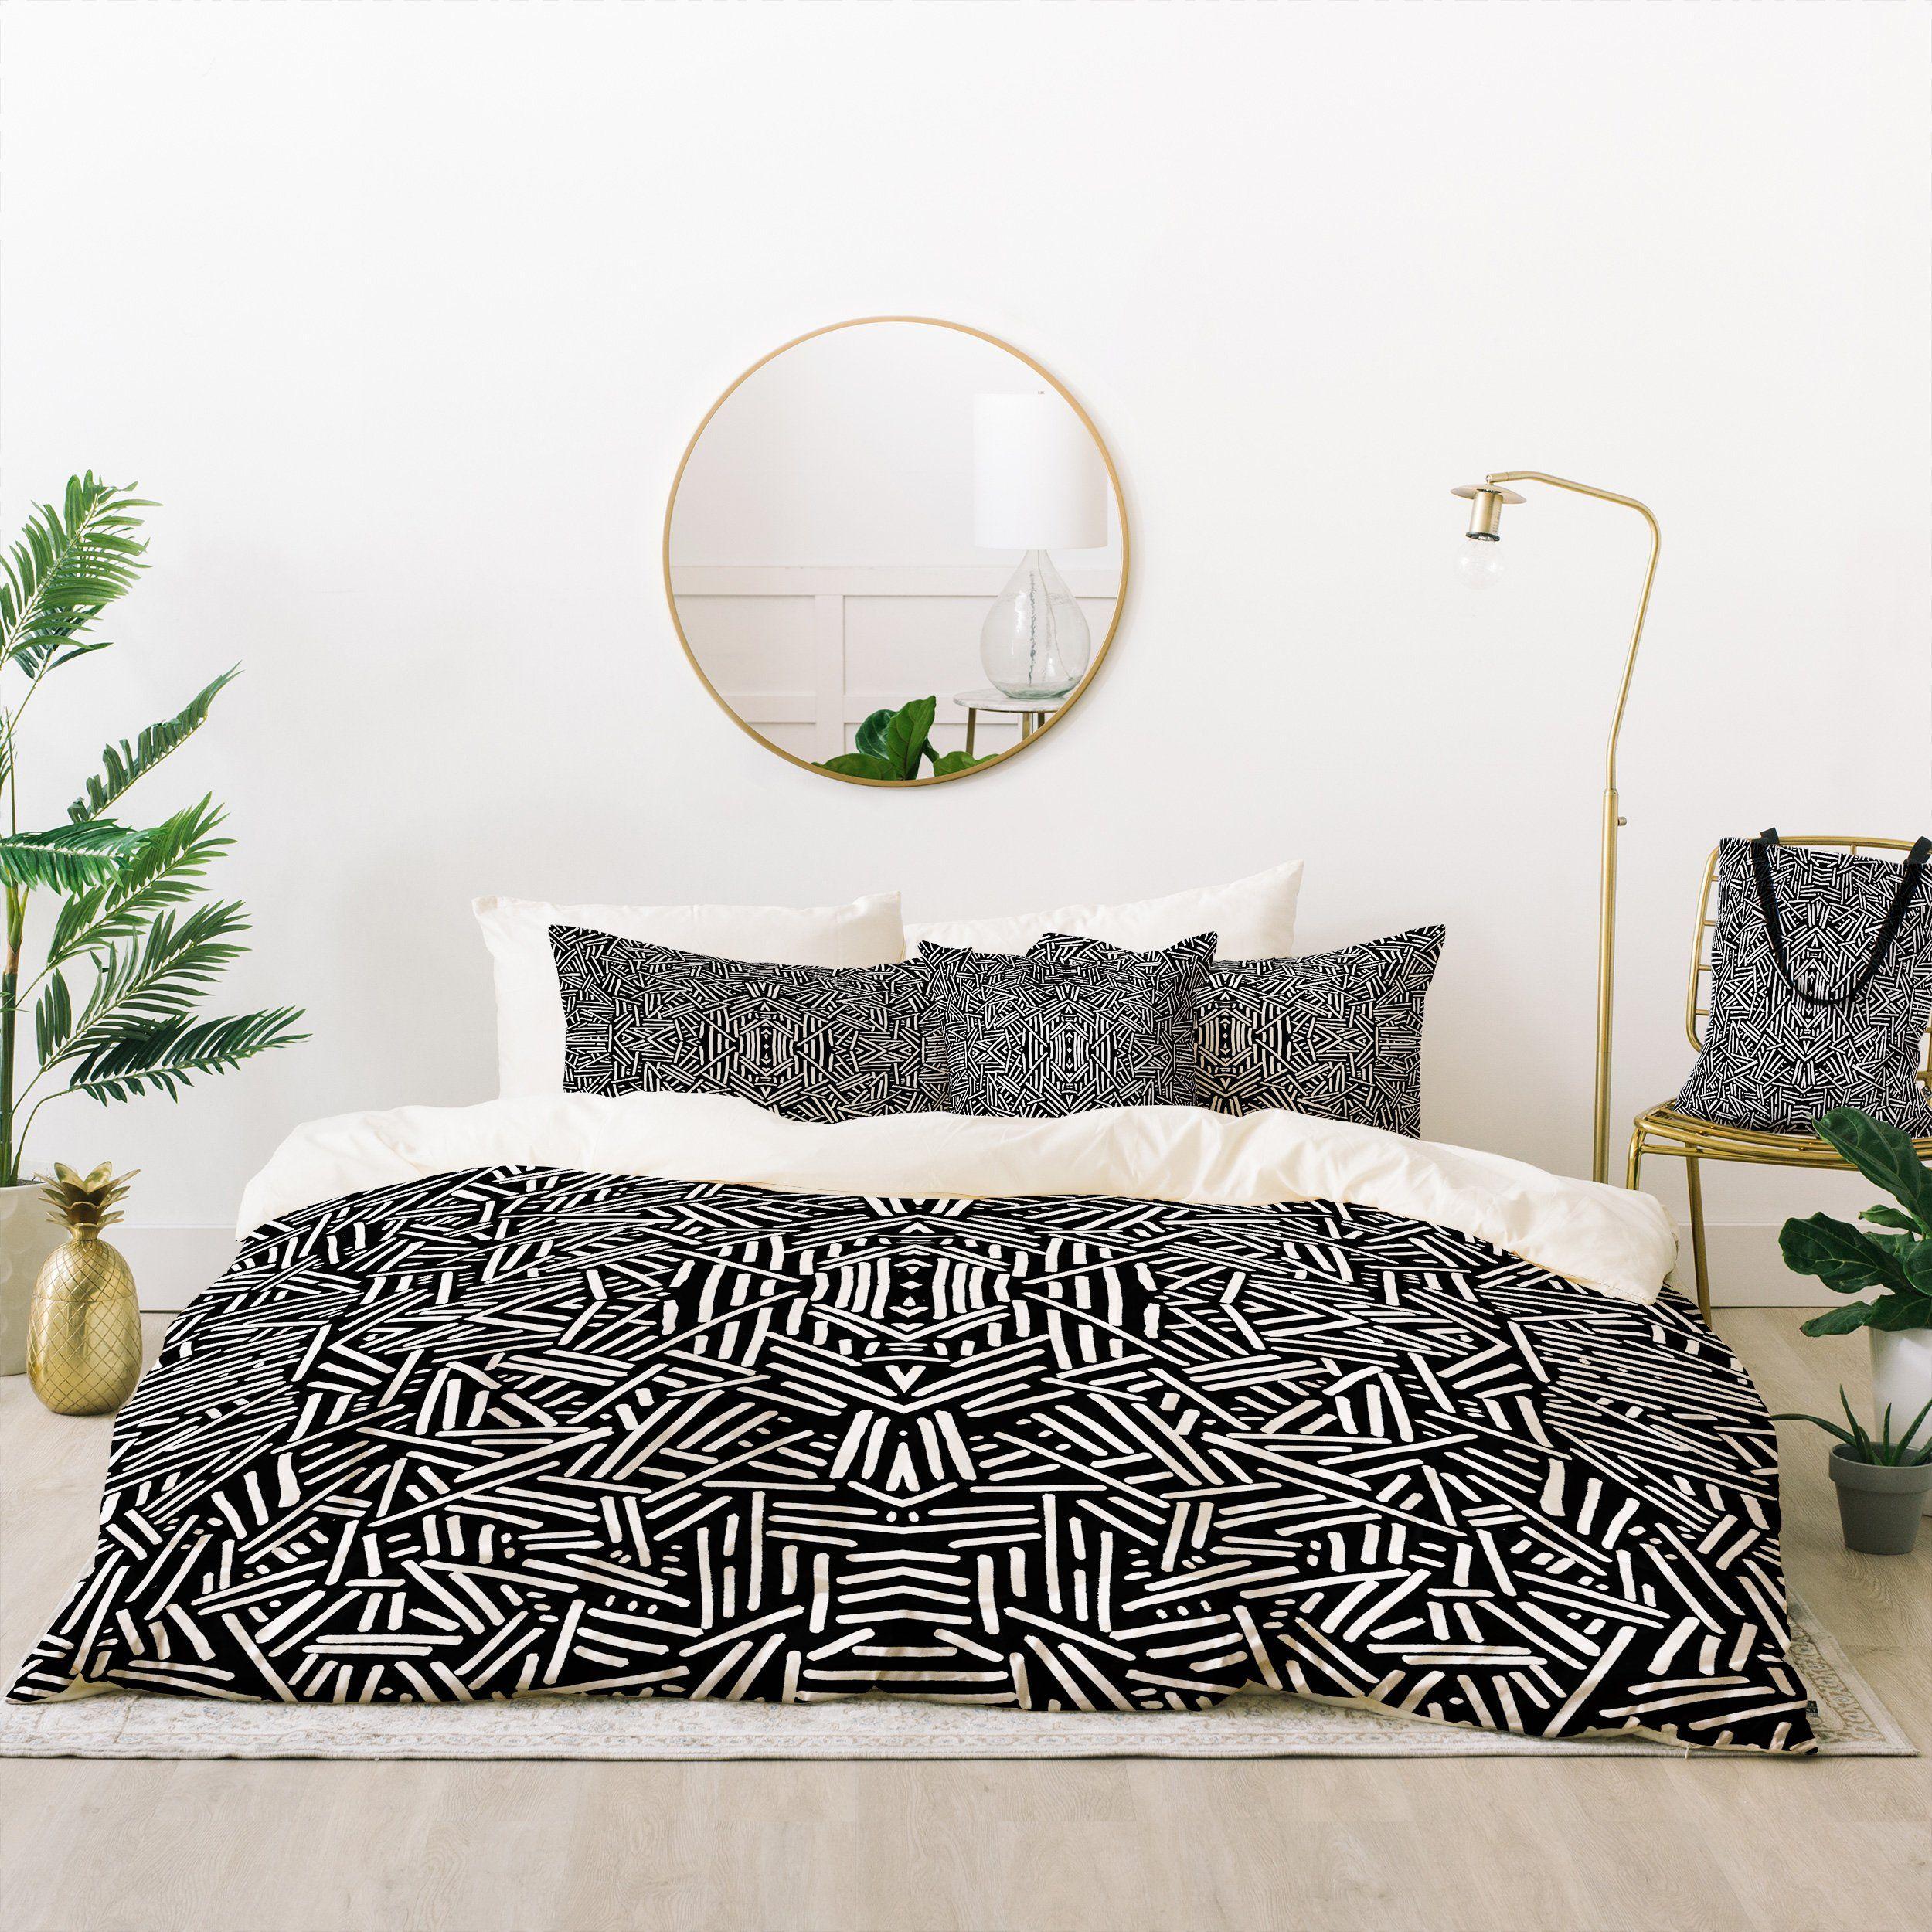 jacqueline maldonado radiate black white bed in a bag duvet throw